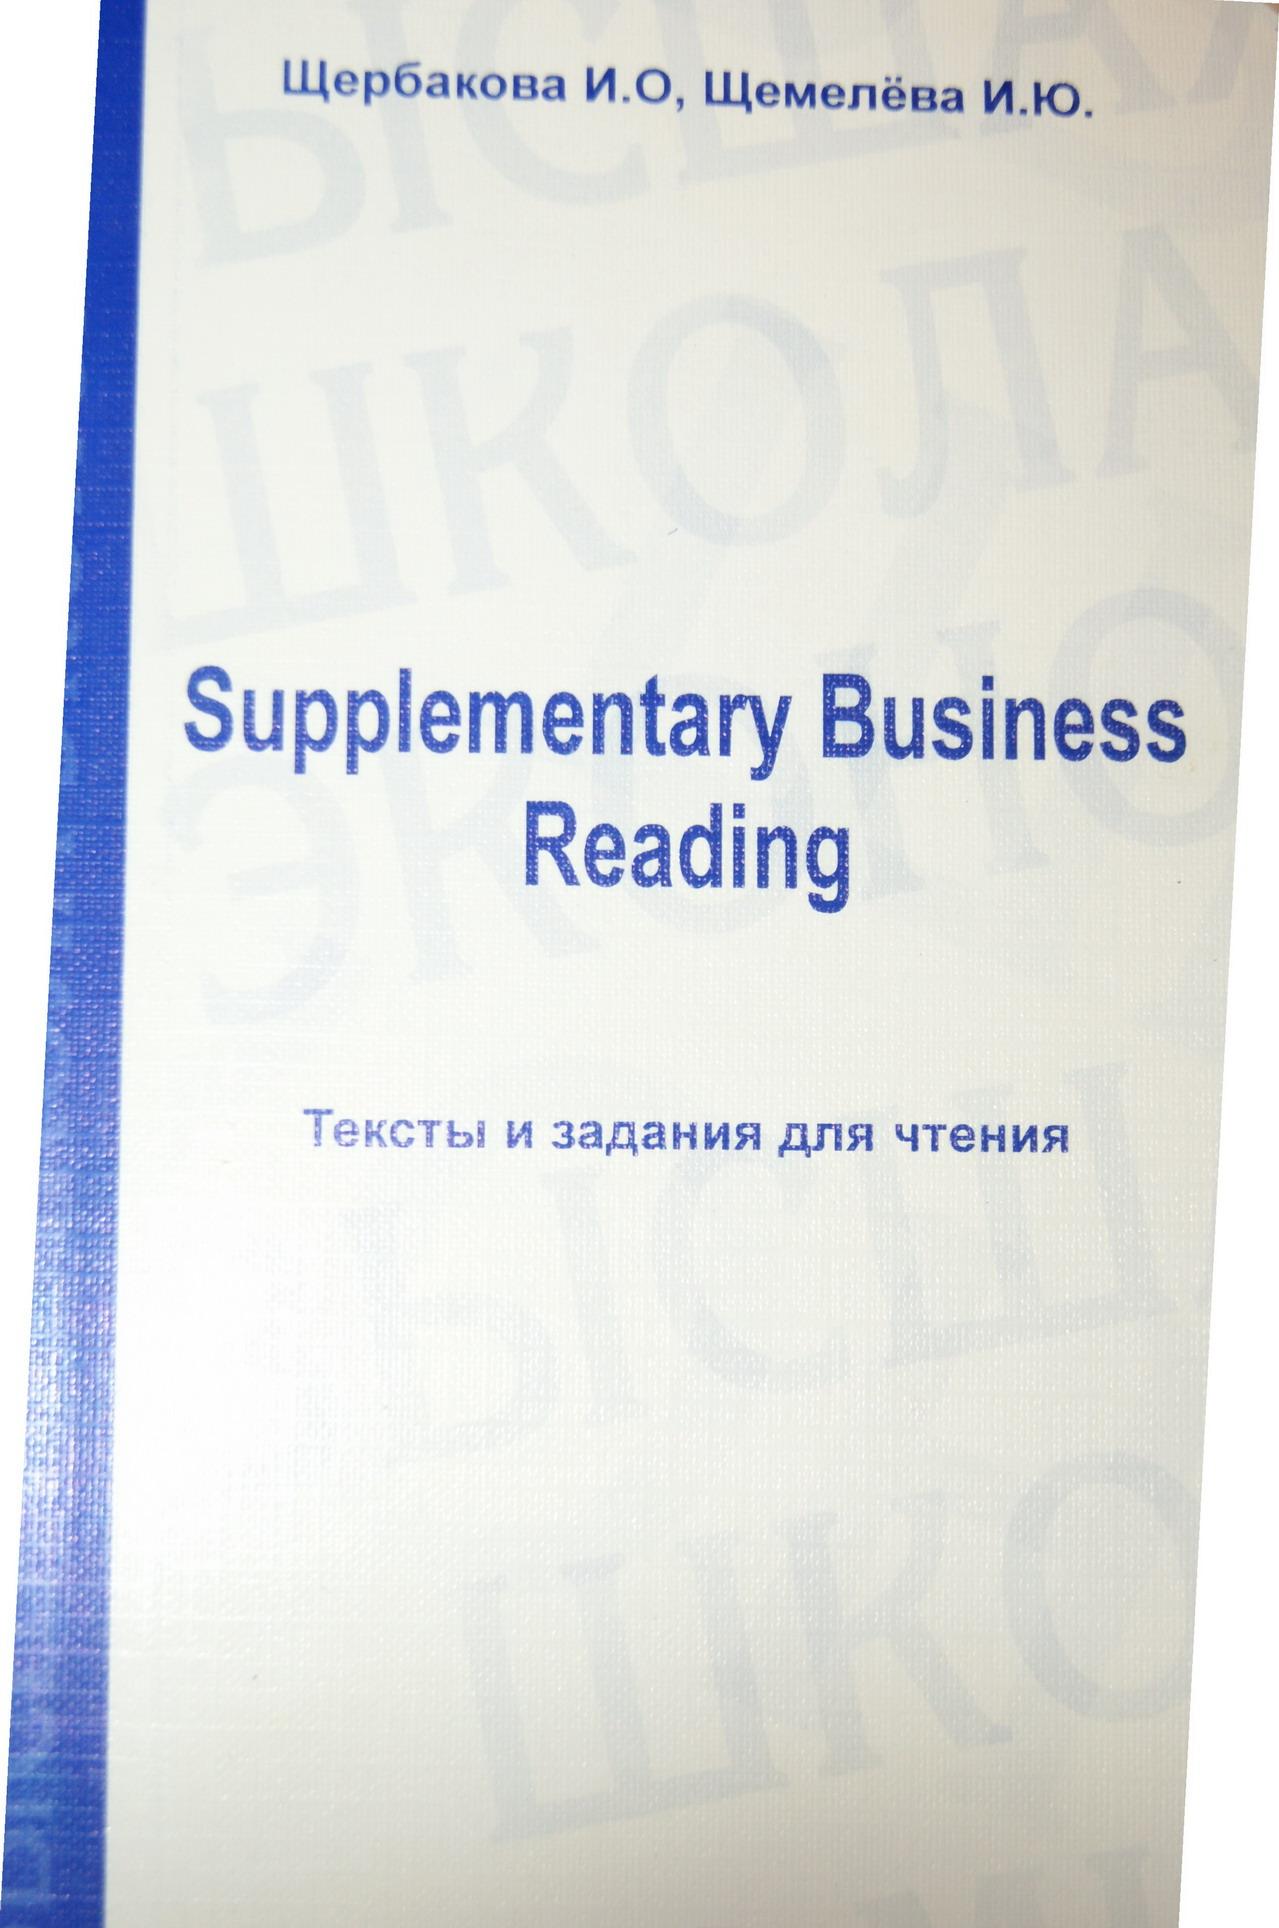 Supplementary Business Reading. Тексты и задания для чтения